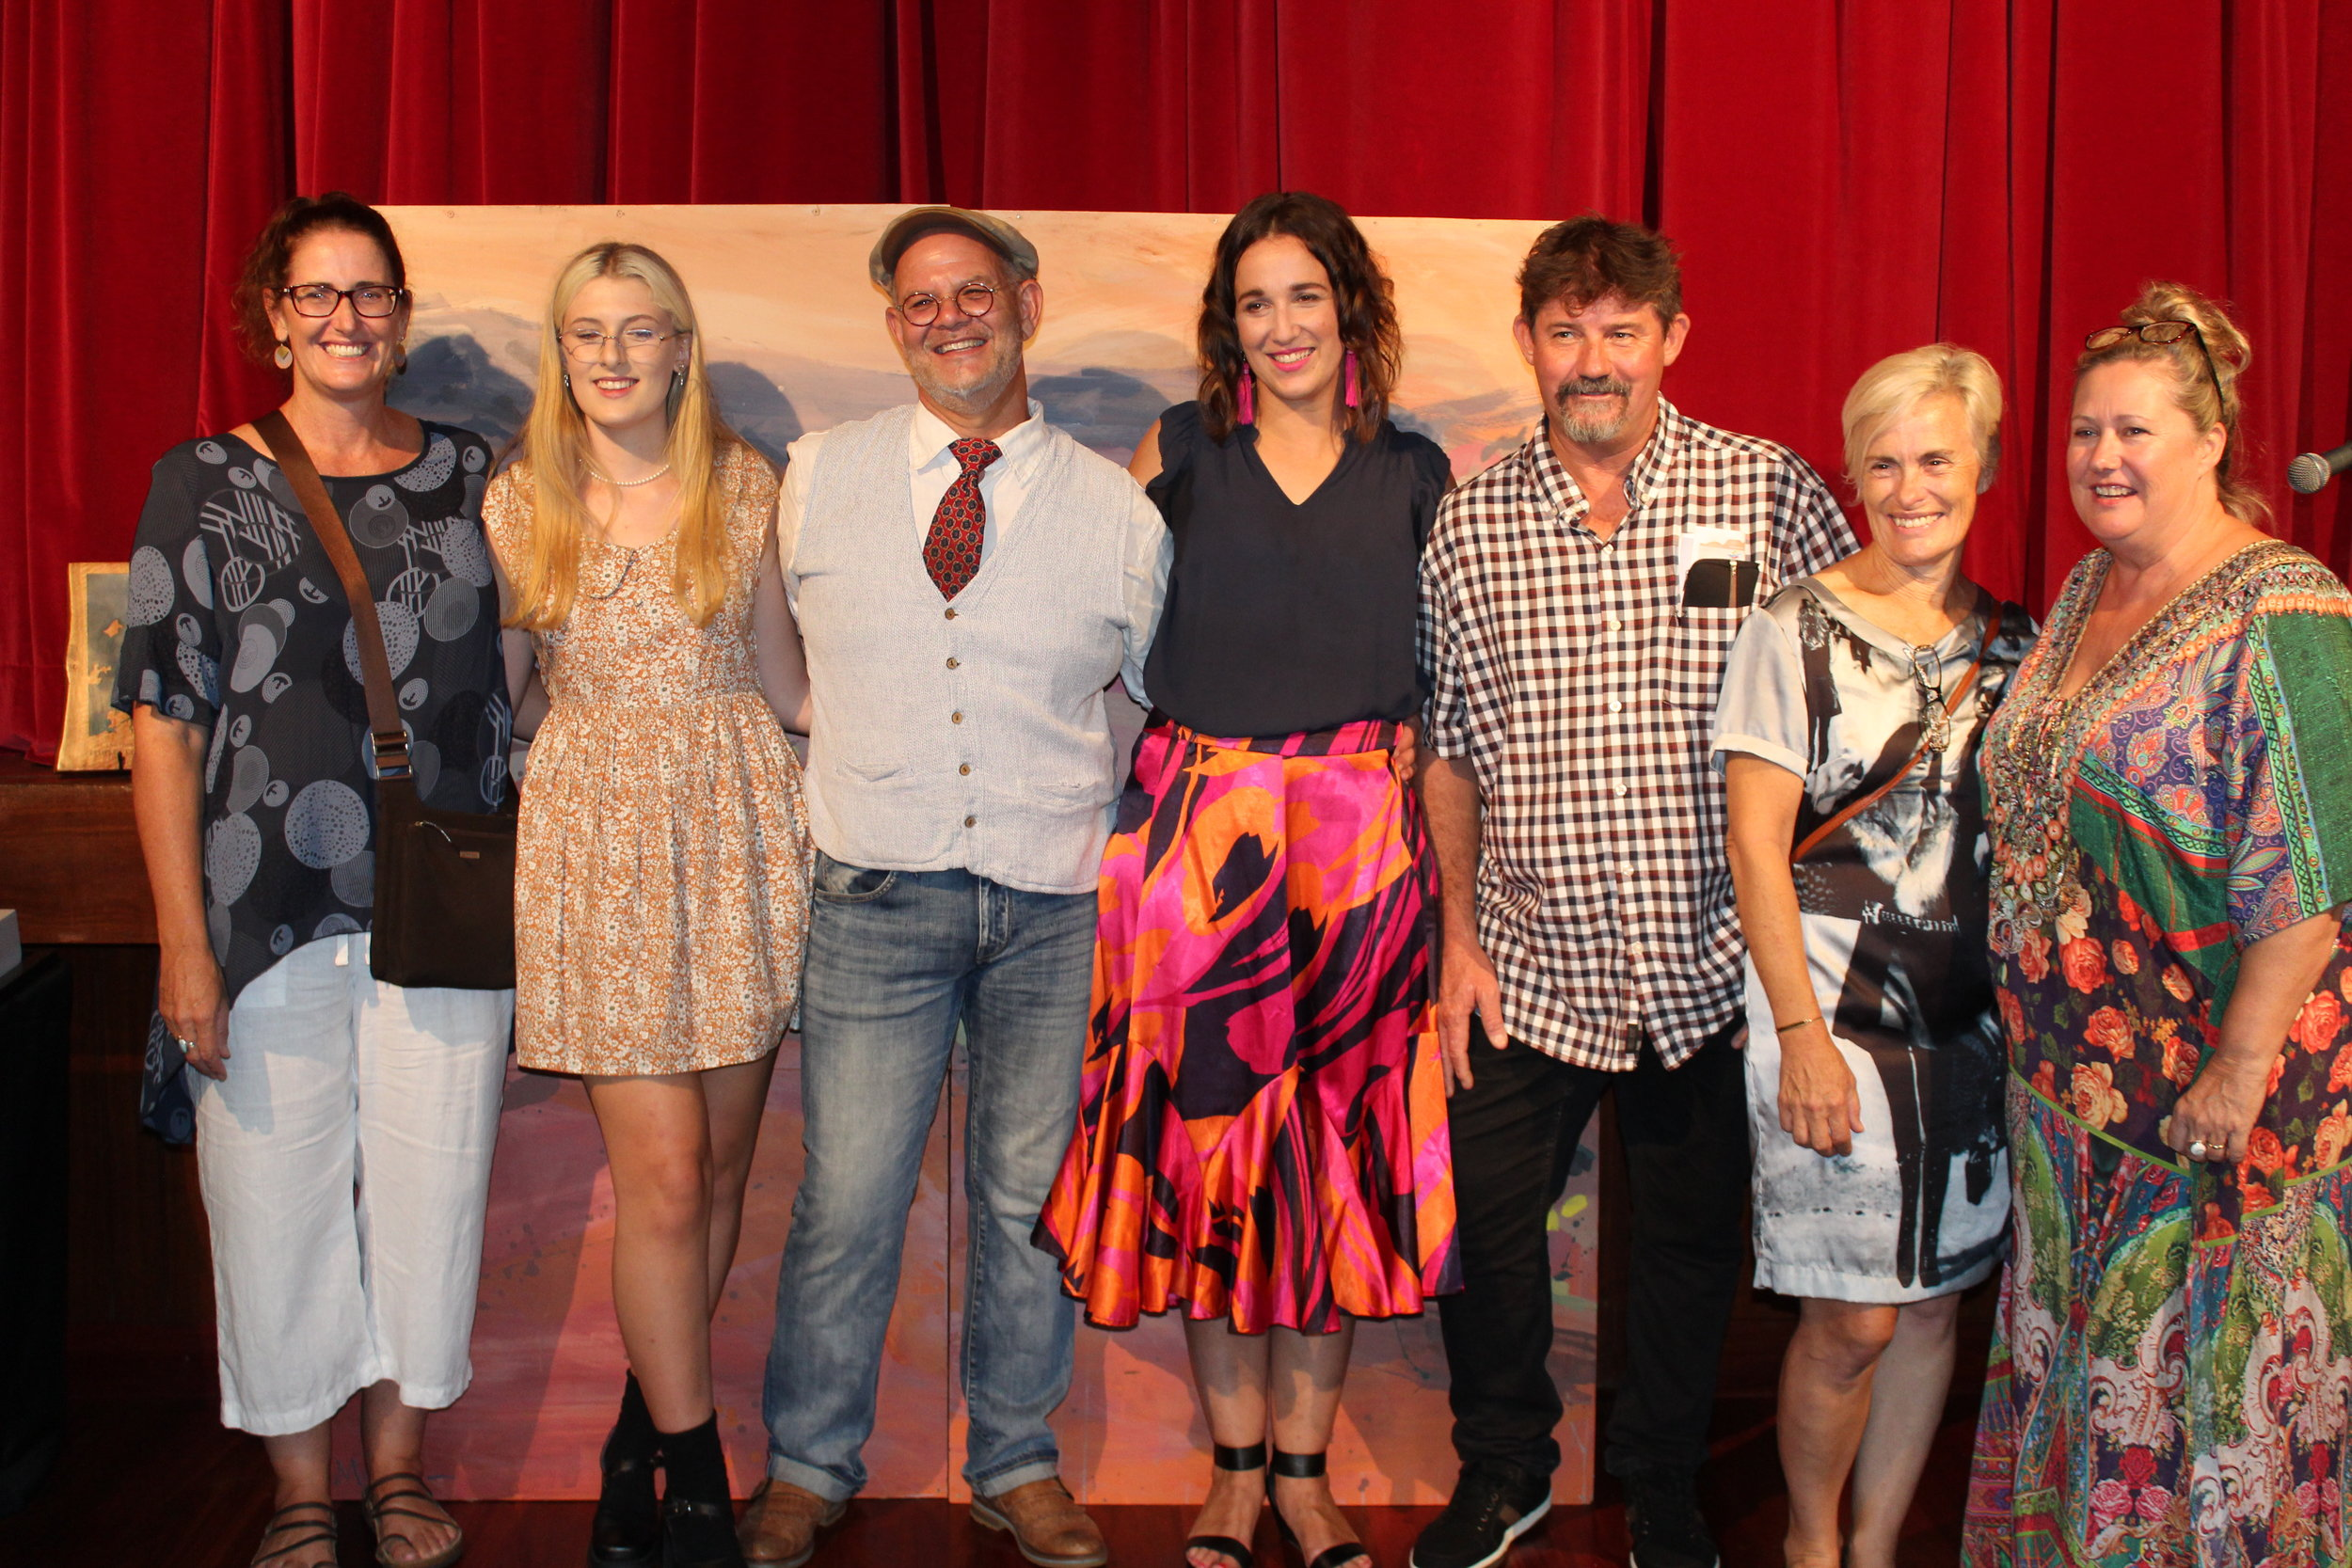 Category Winners : Deanne McGillan, Ebony Bascombe,Geoff Saunders, Tanya Montgomery (Judge), Shaun Wigley, Carrie McDowell and Robbie Palmer.